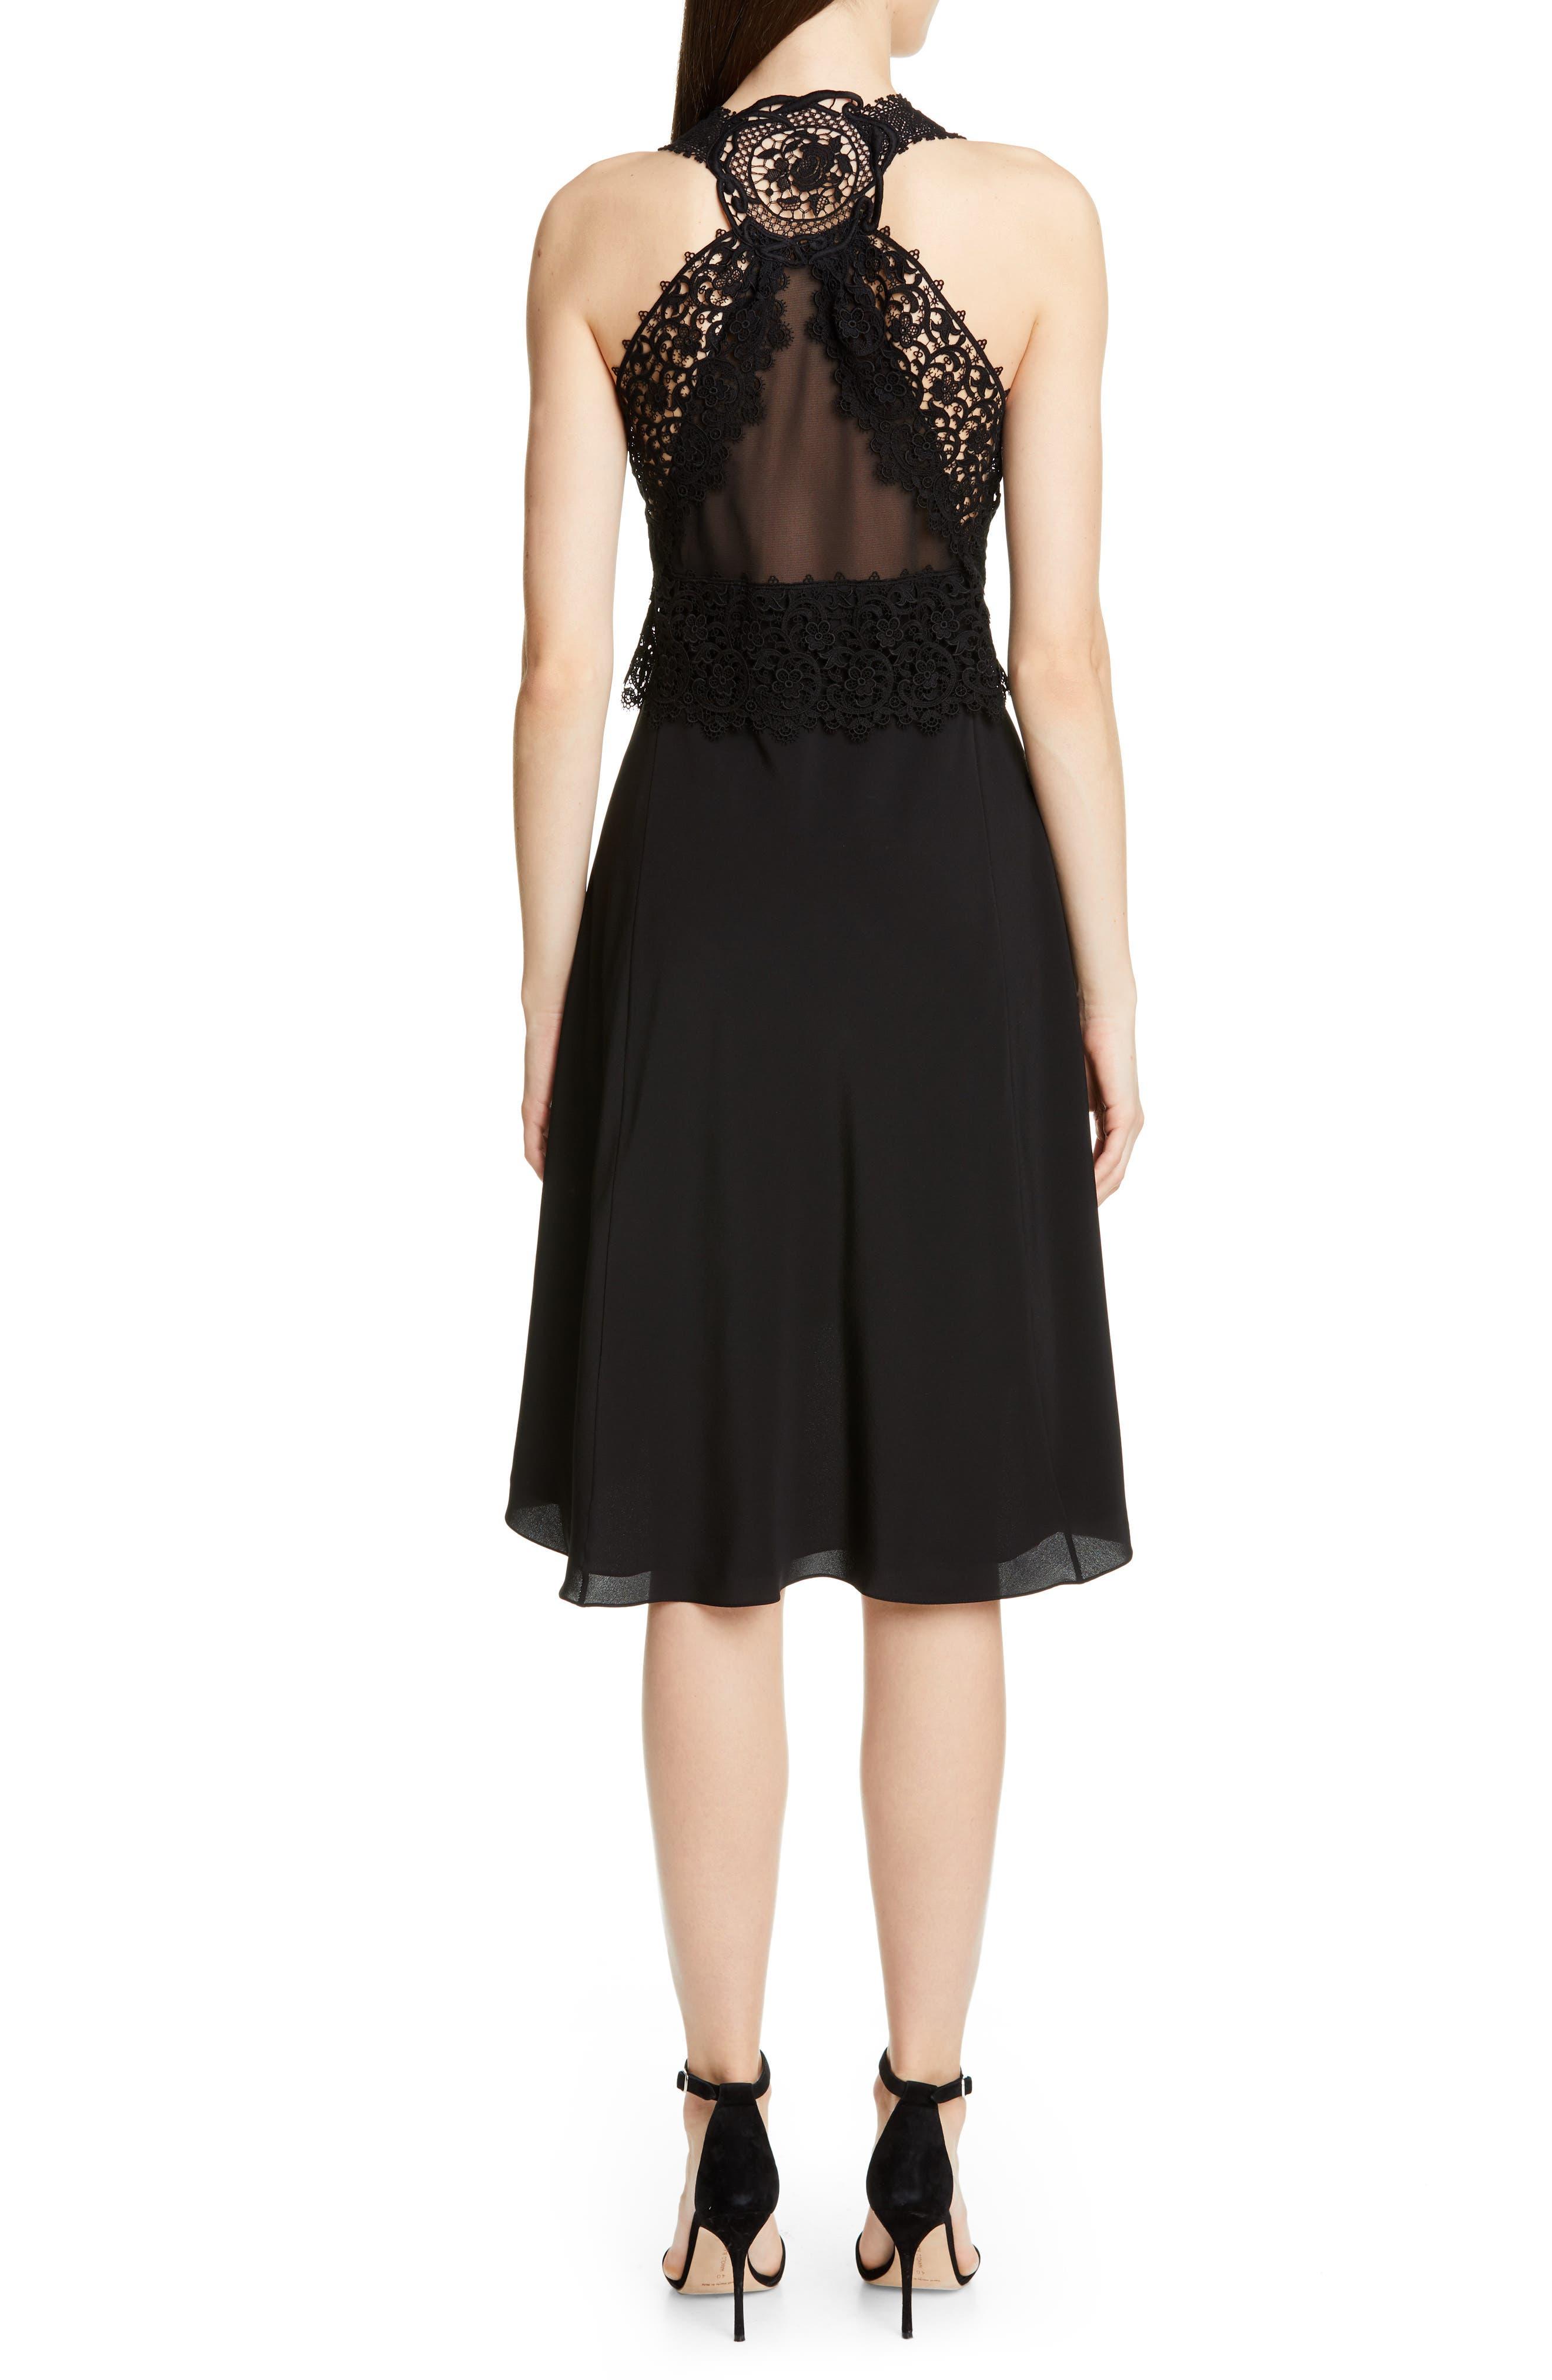 VICTORIA BECKHAM, Mixed Lace Trim High/Low Silk Dress, Alternate thumbnail 2, color, BLACK